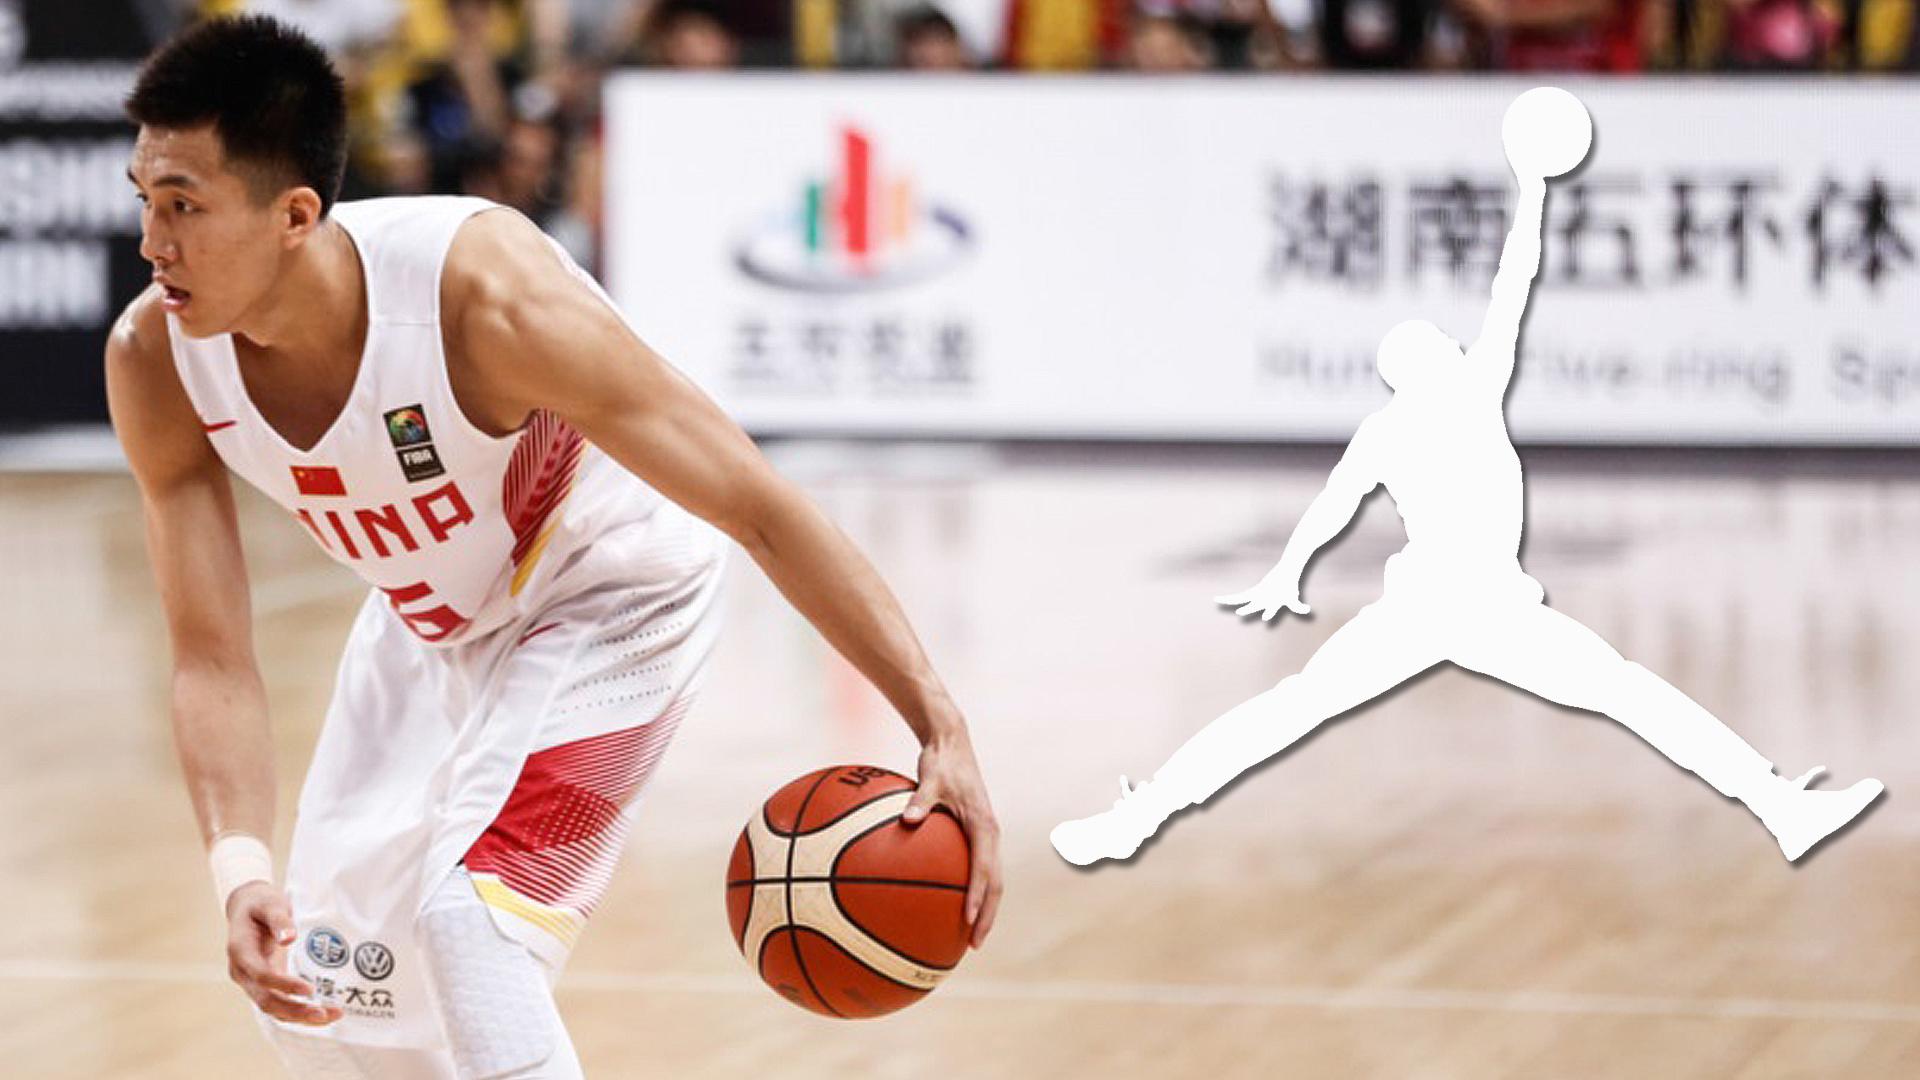 Jordan Brand Signs Guo Ailun, a Chinese